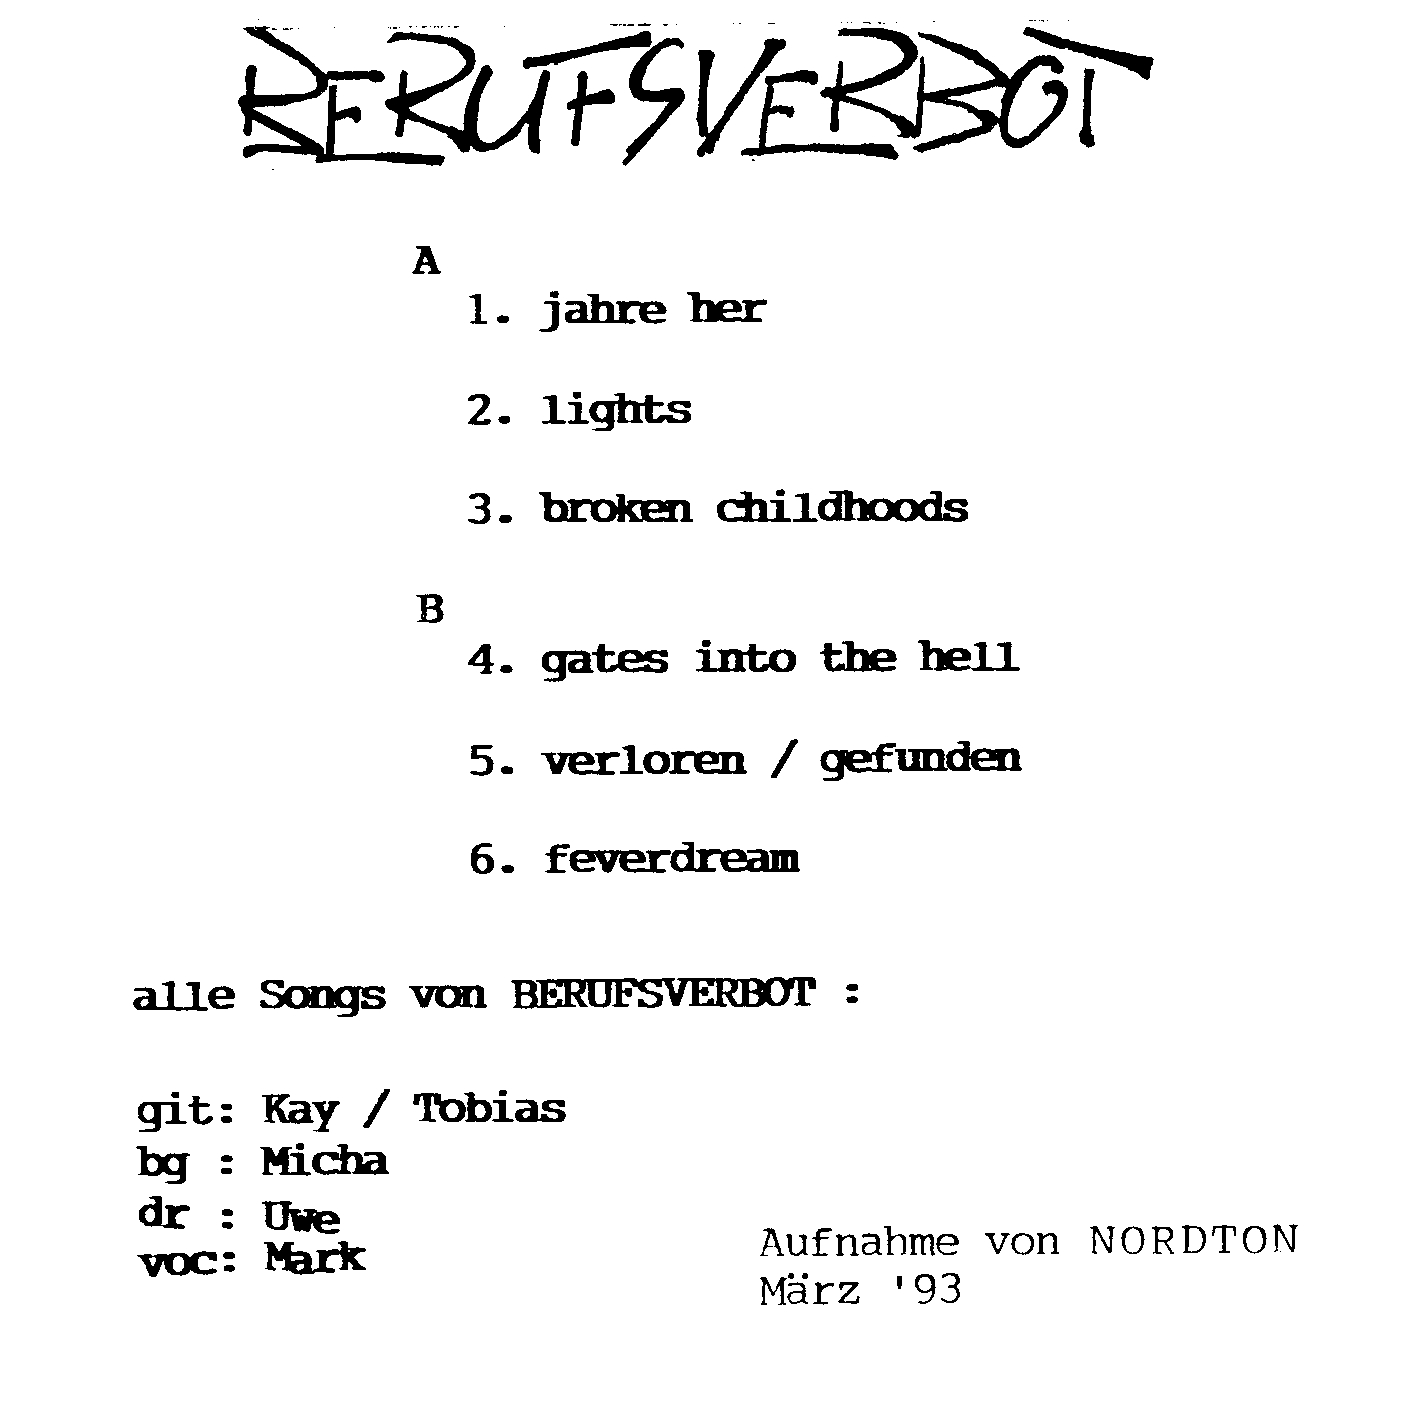 Berufsverbot - Berufsverbot (1993)